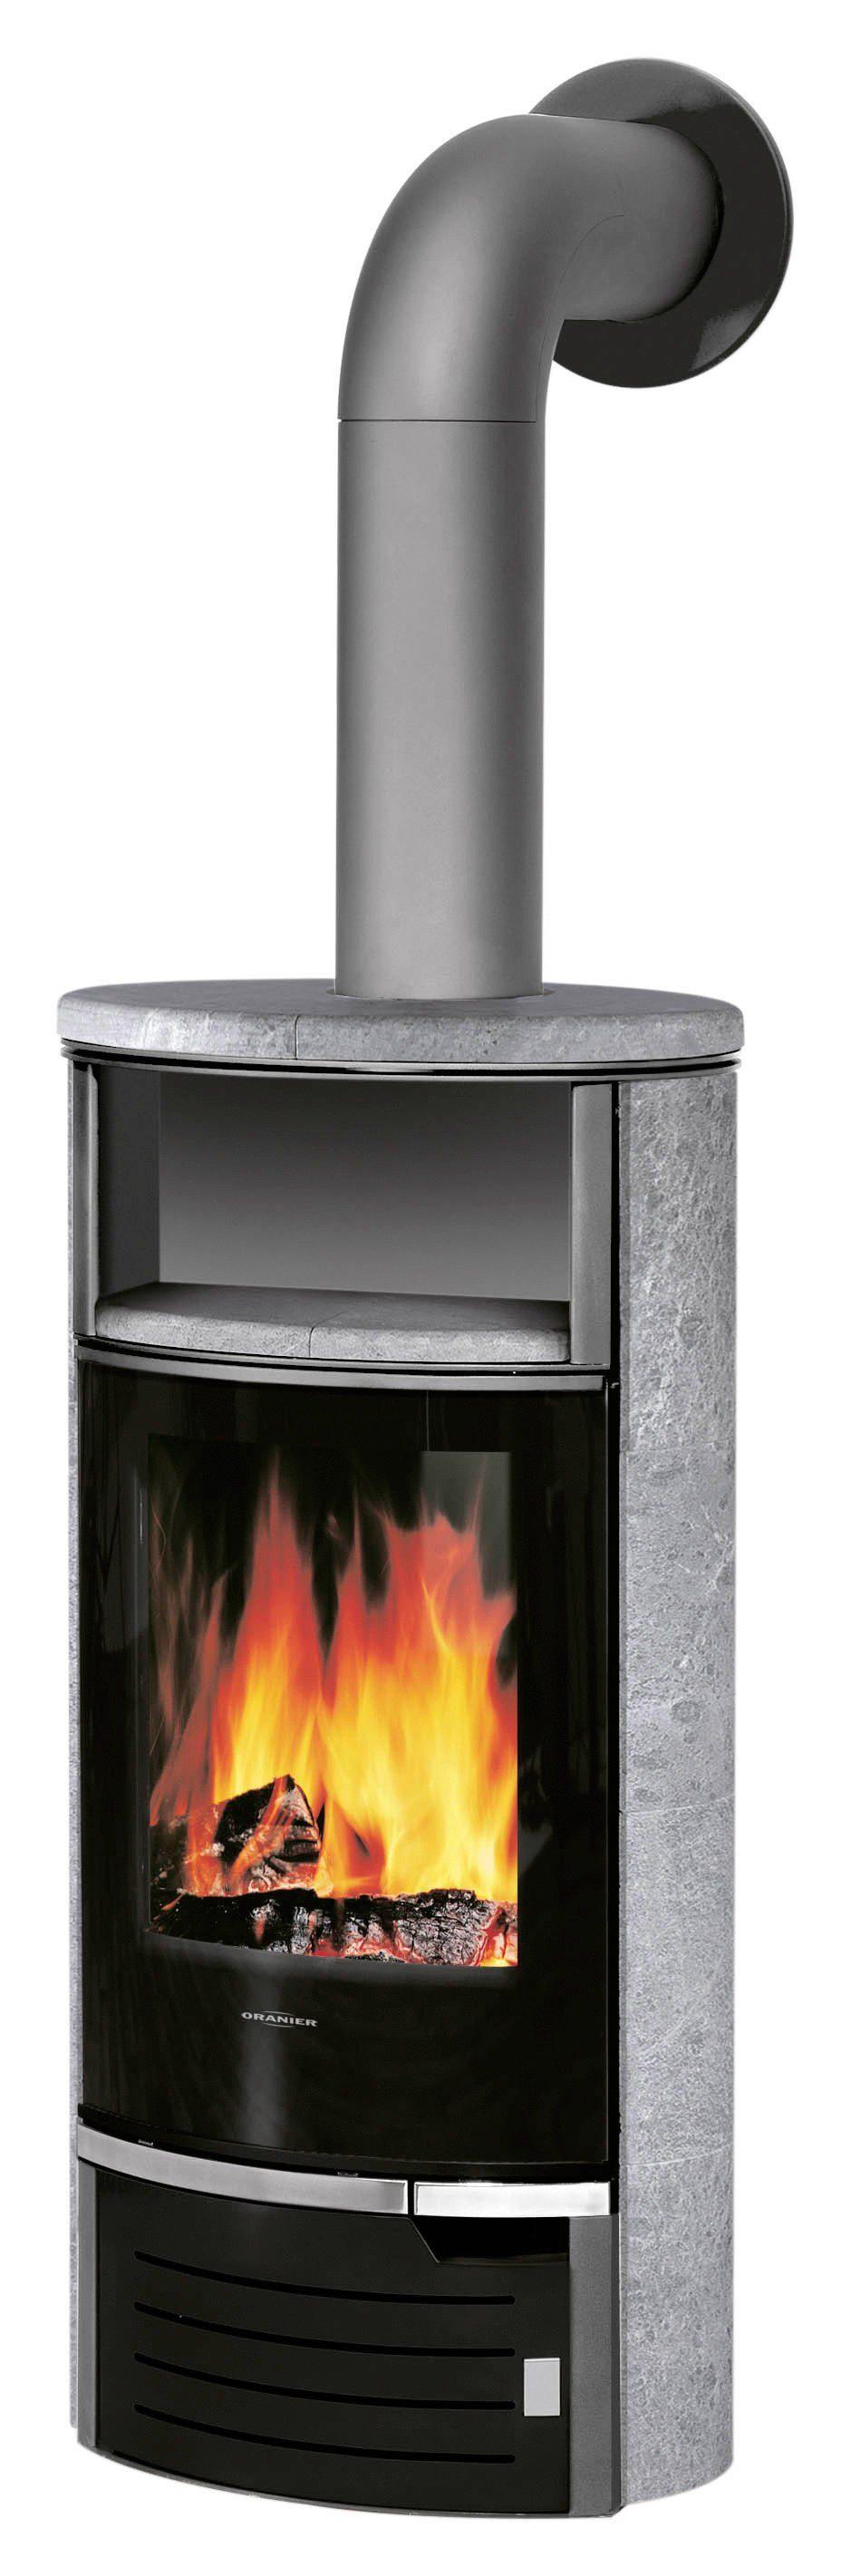 Oranier Kaminofen »Thalia 5« 5 kW, Dauerbrand